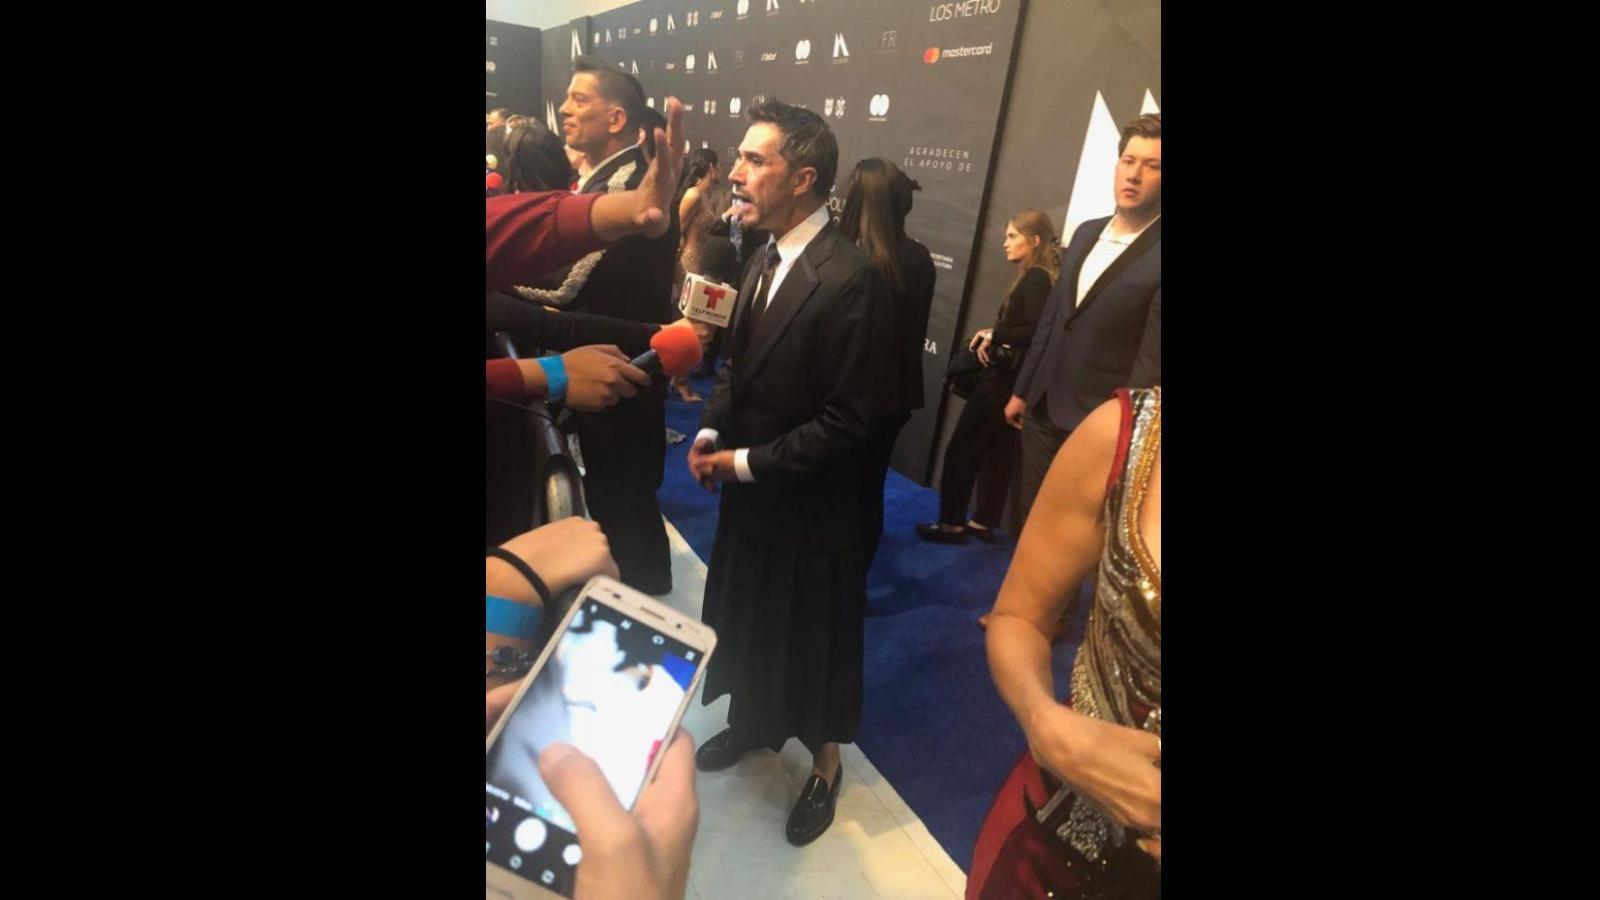 Sergio Mayer usa falda para apoyar movimiento feminista